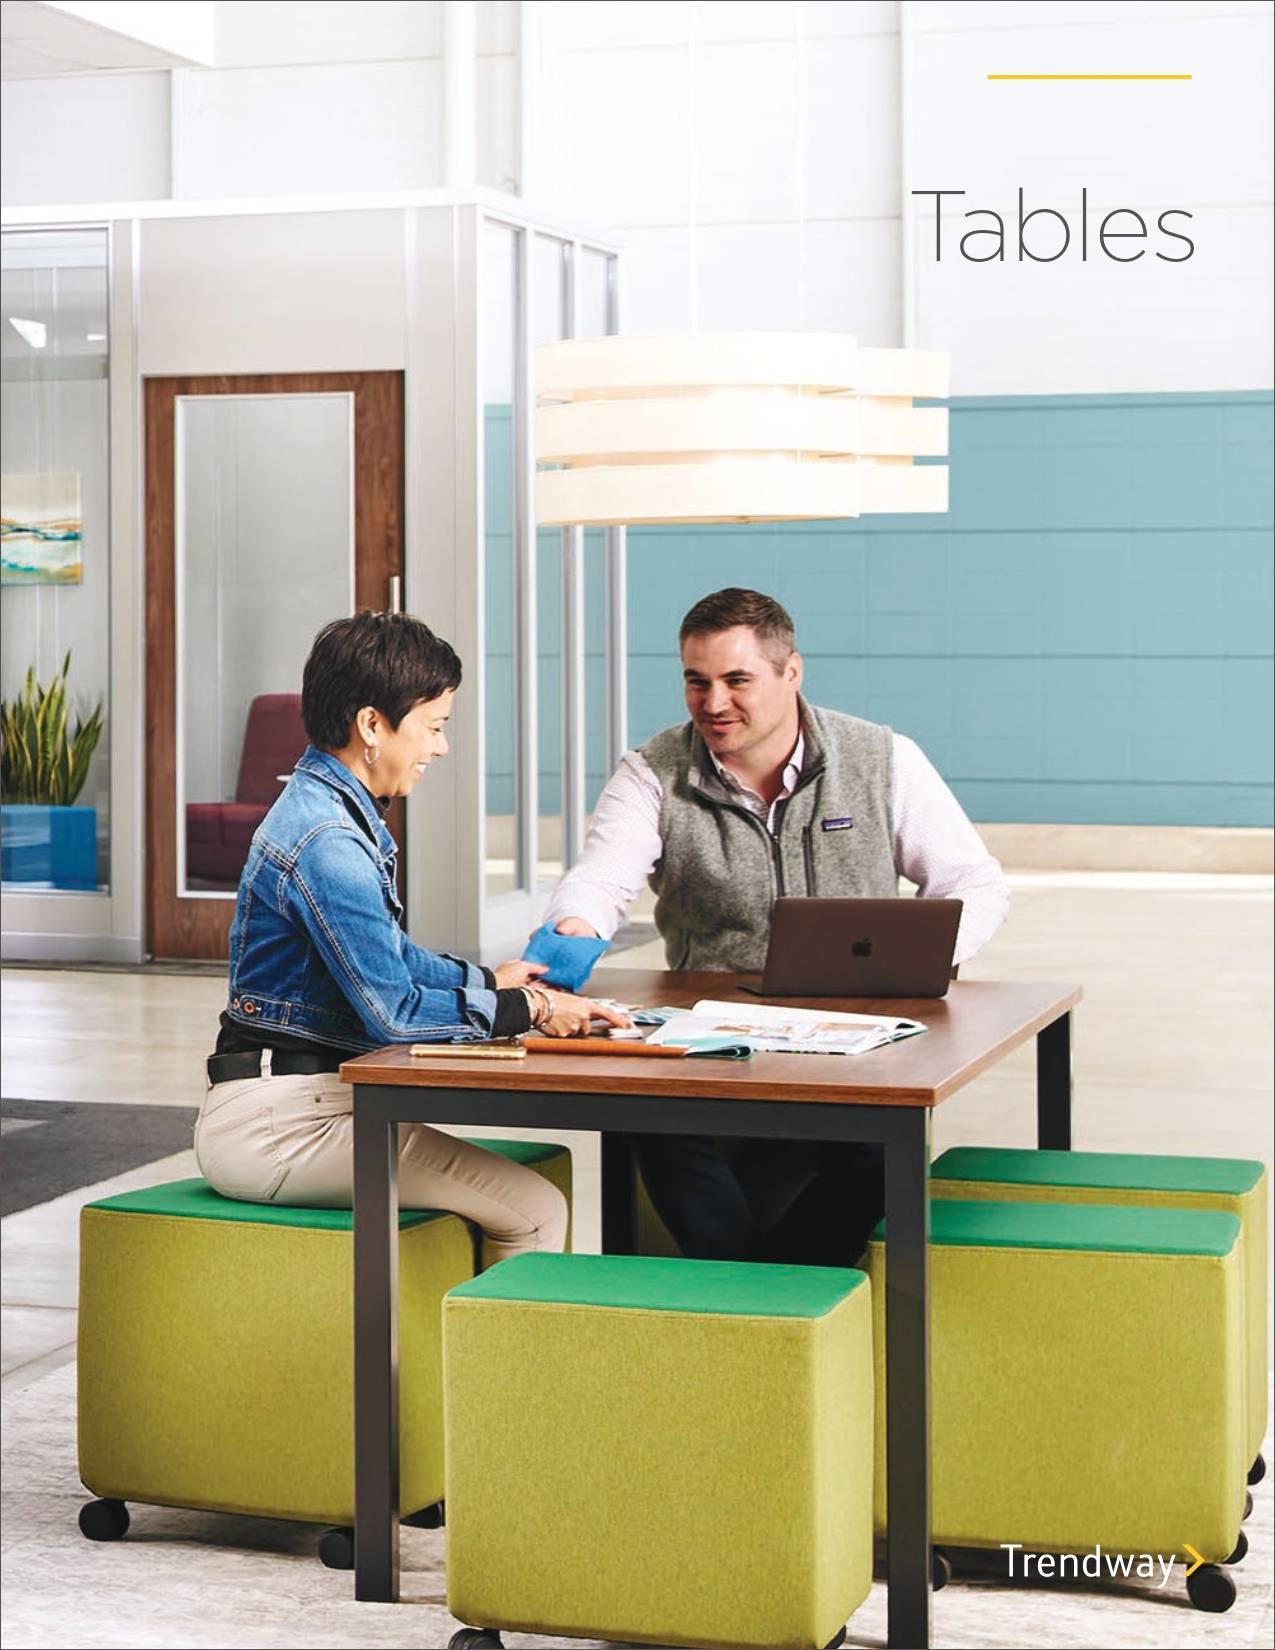 Trendway Furniture Tables Brochure